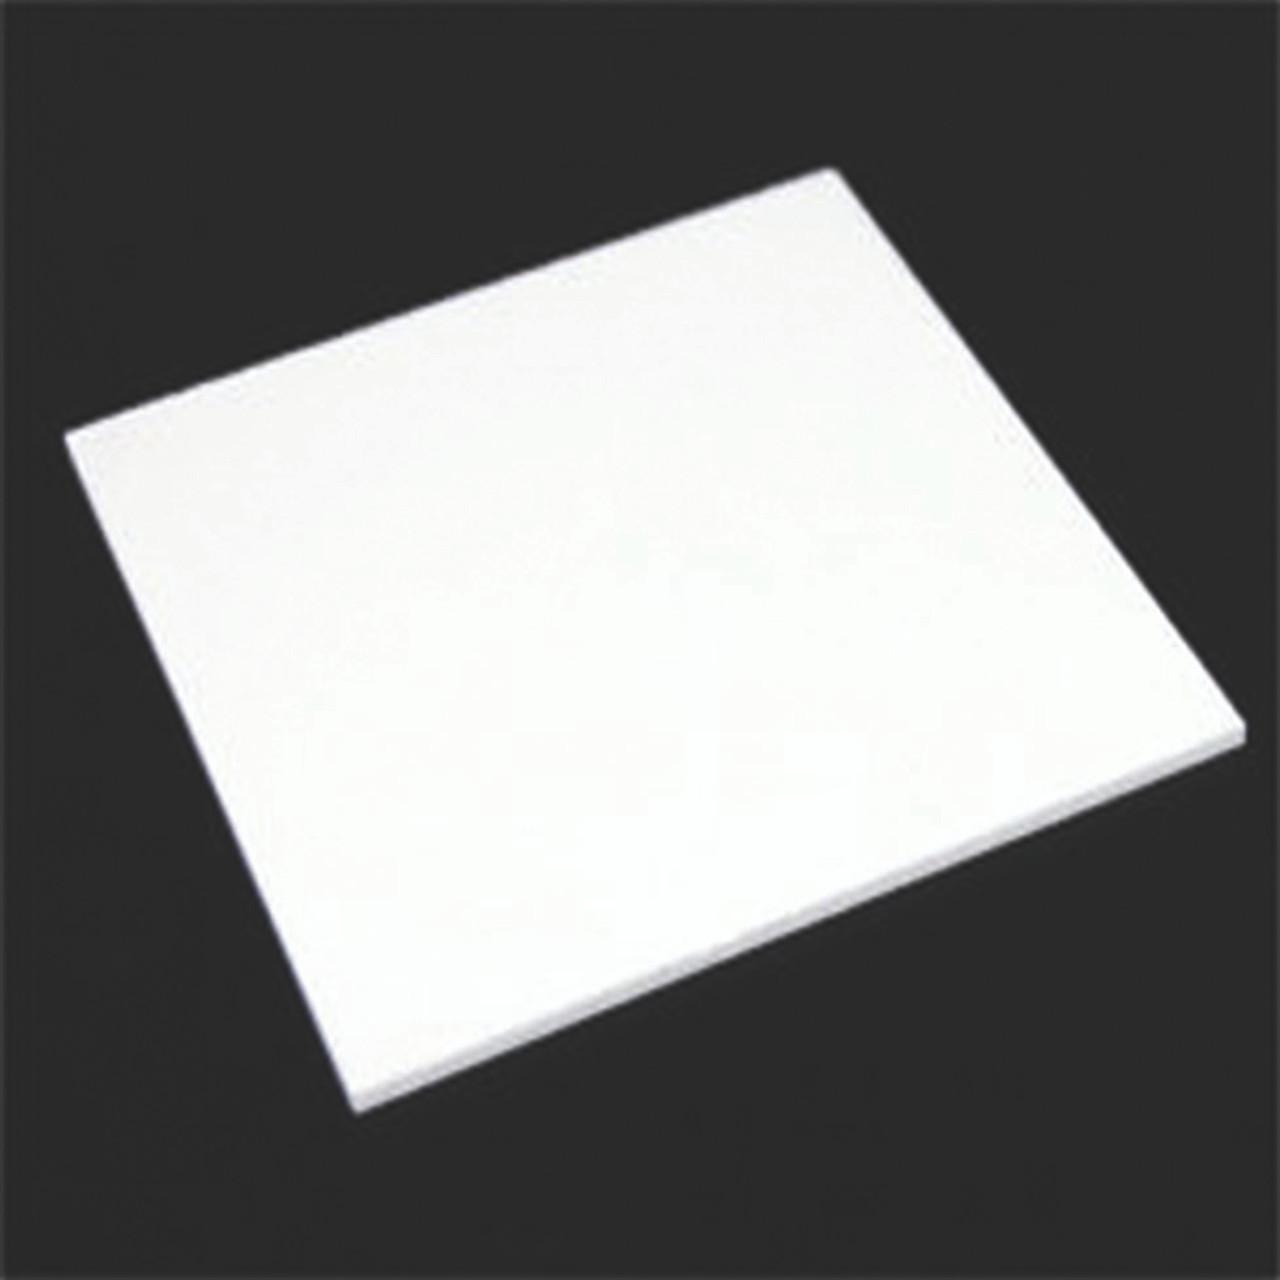 "4' x 8' x 1/8"" Opaque White Acrylic Sheet"